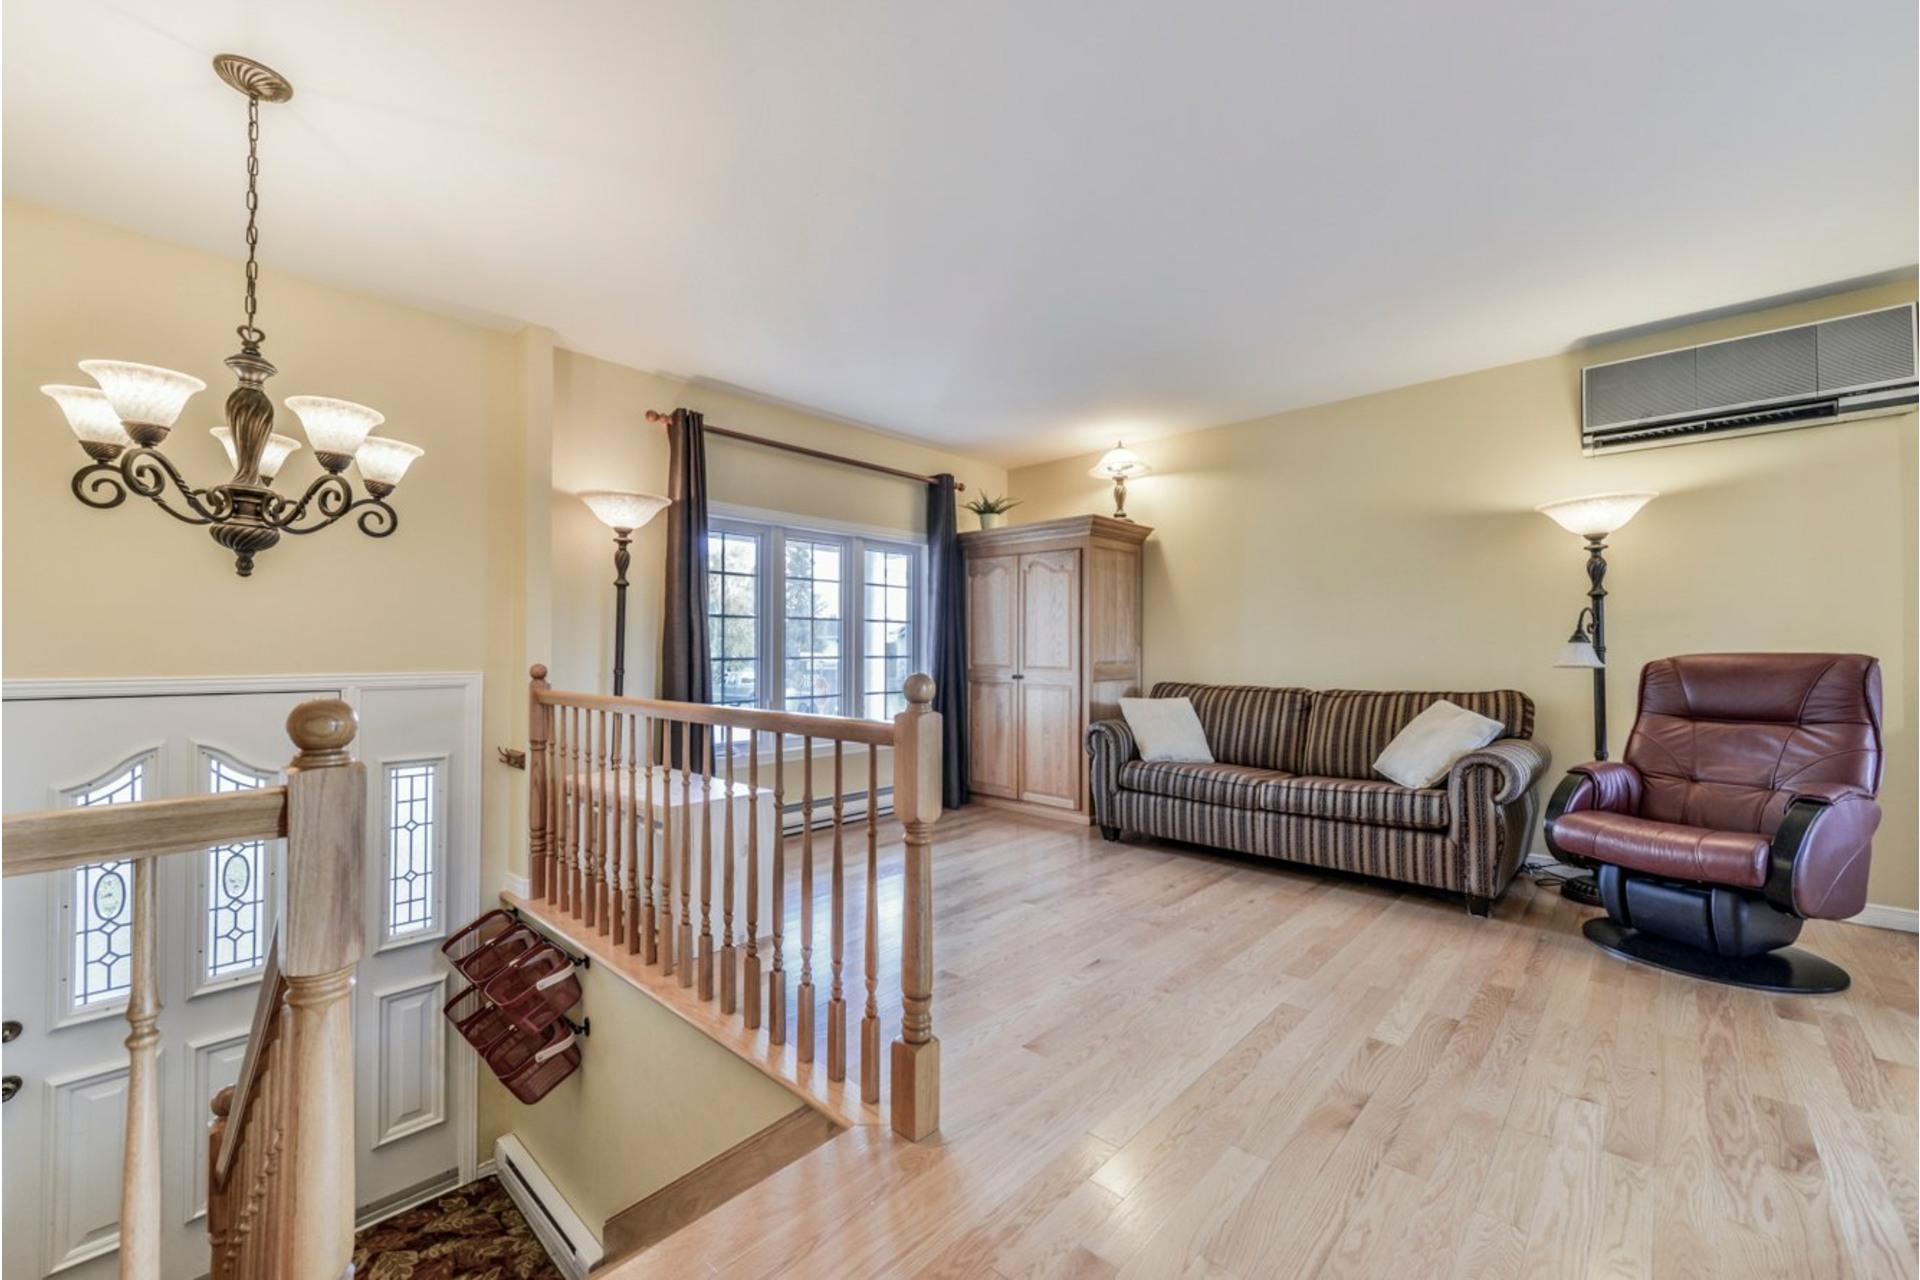 image 3 - House For sale Saint-Basile-le-Grand - 7 rooms